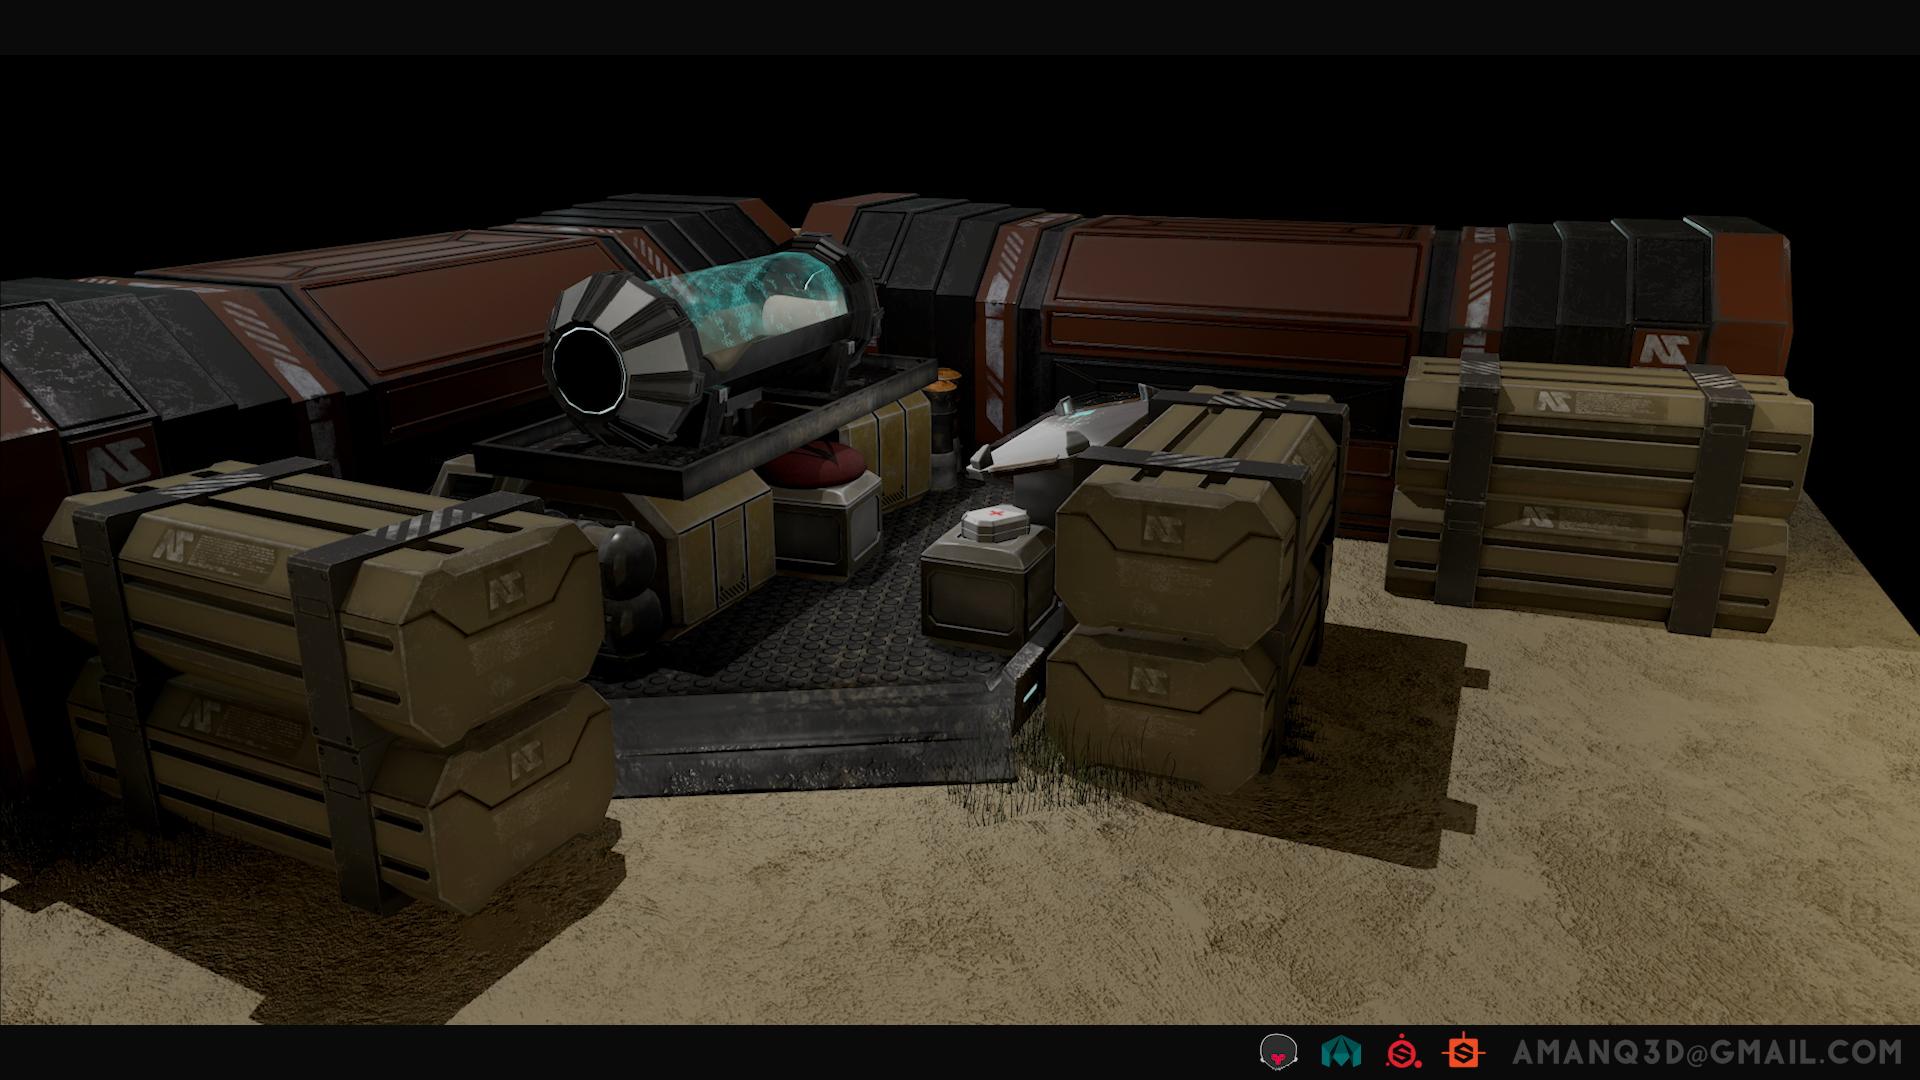 Planetside 2 Diorama